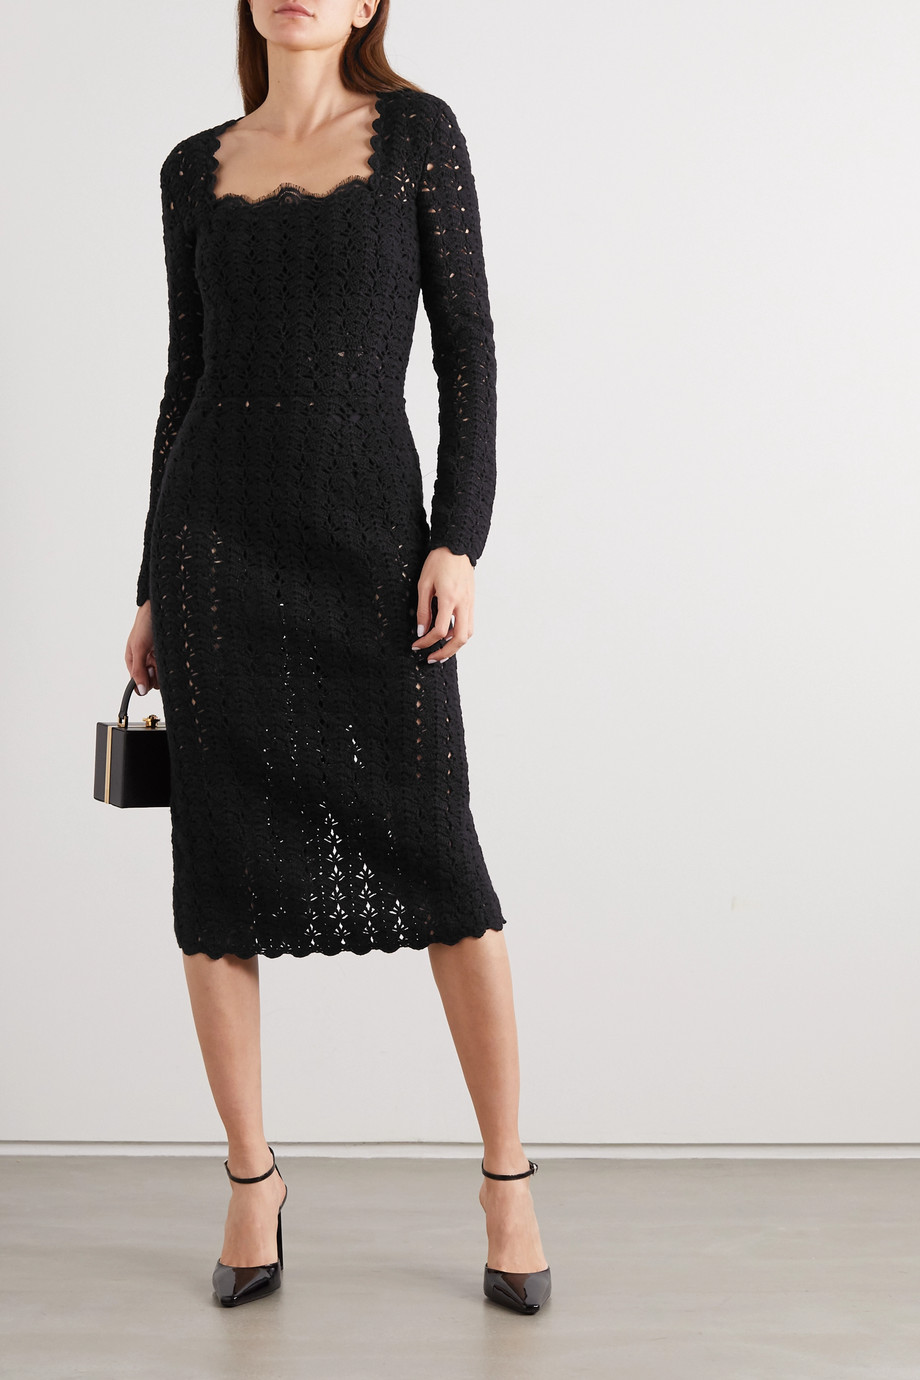 Dolce & Gabbana Crocheted wool and cashmere-blend midi dress